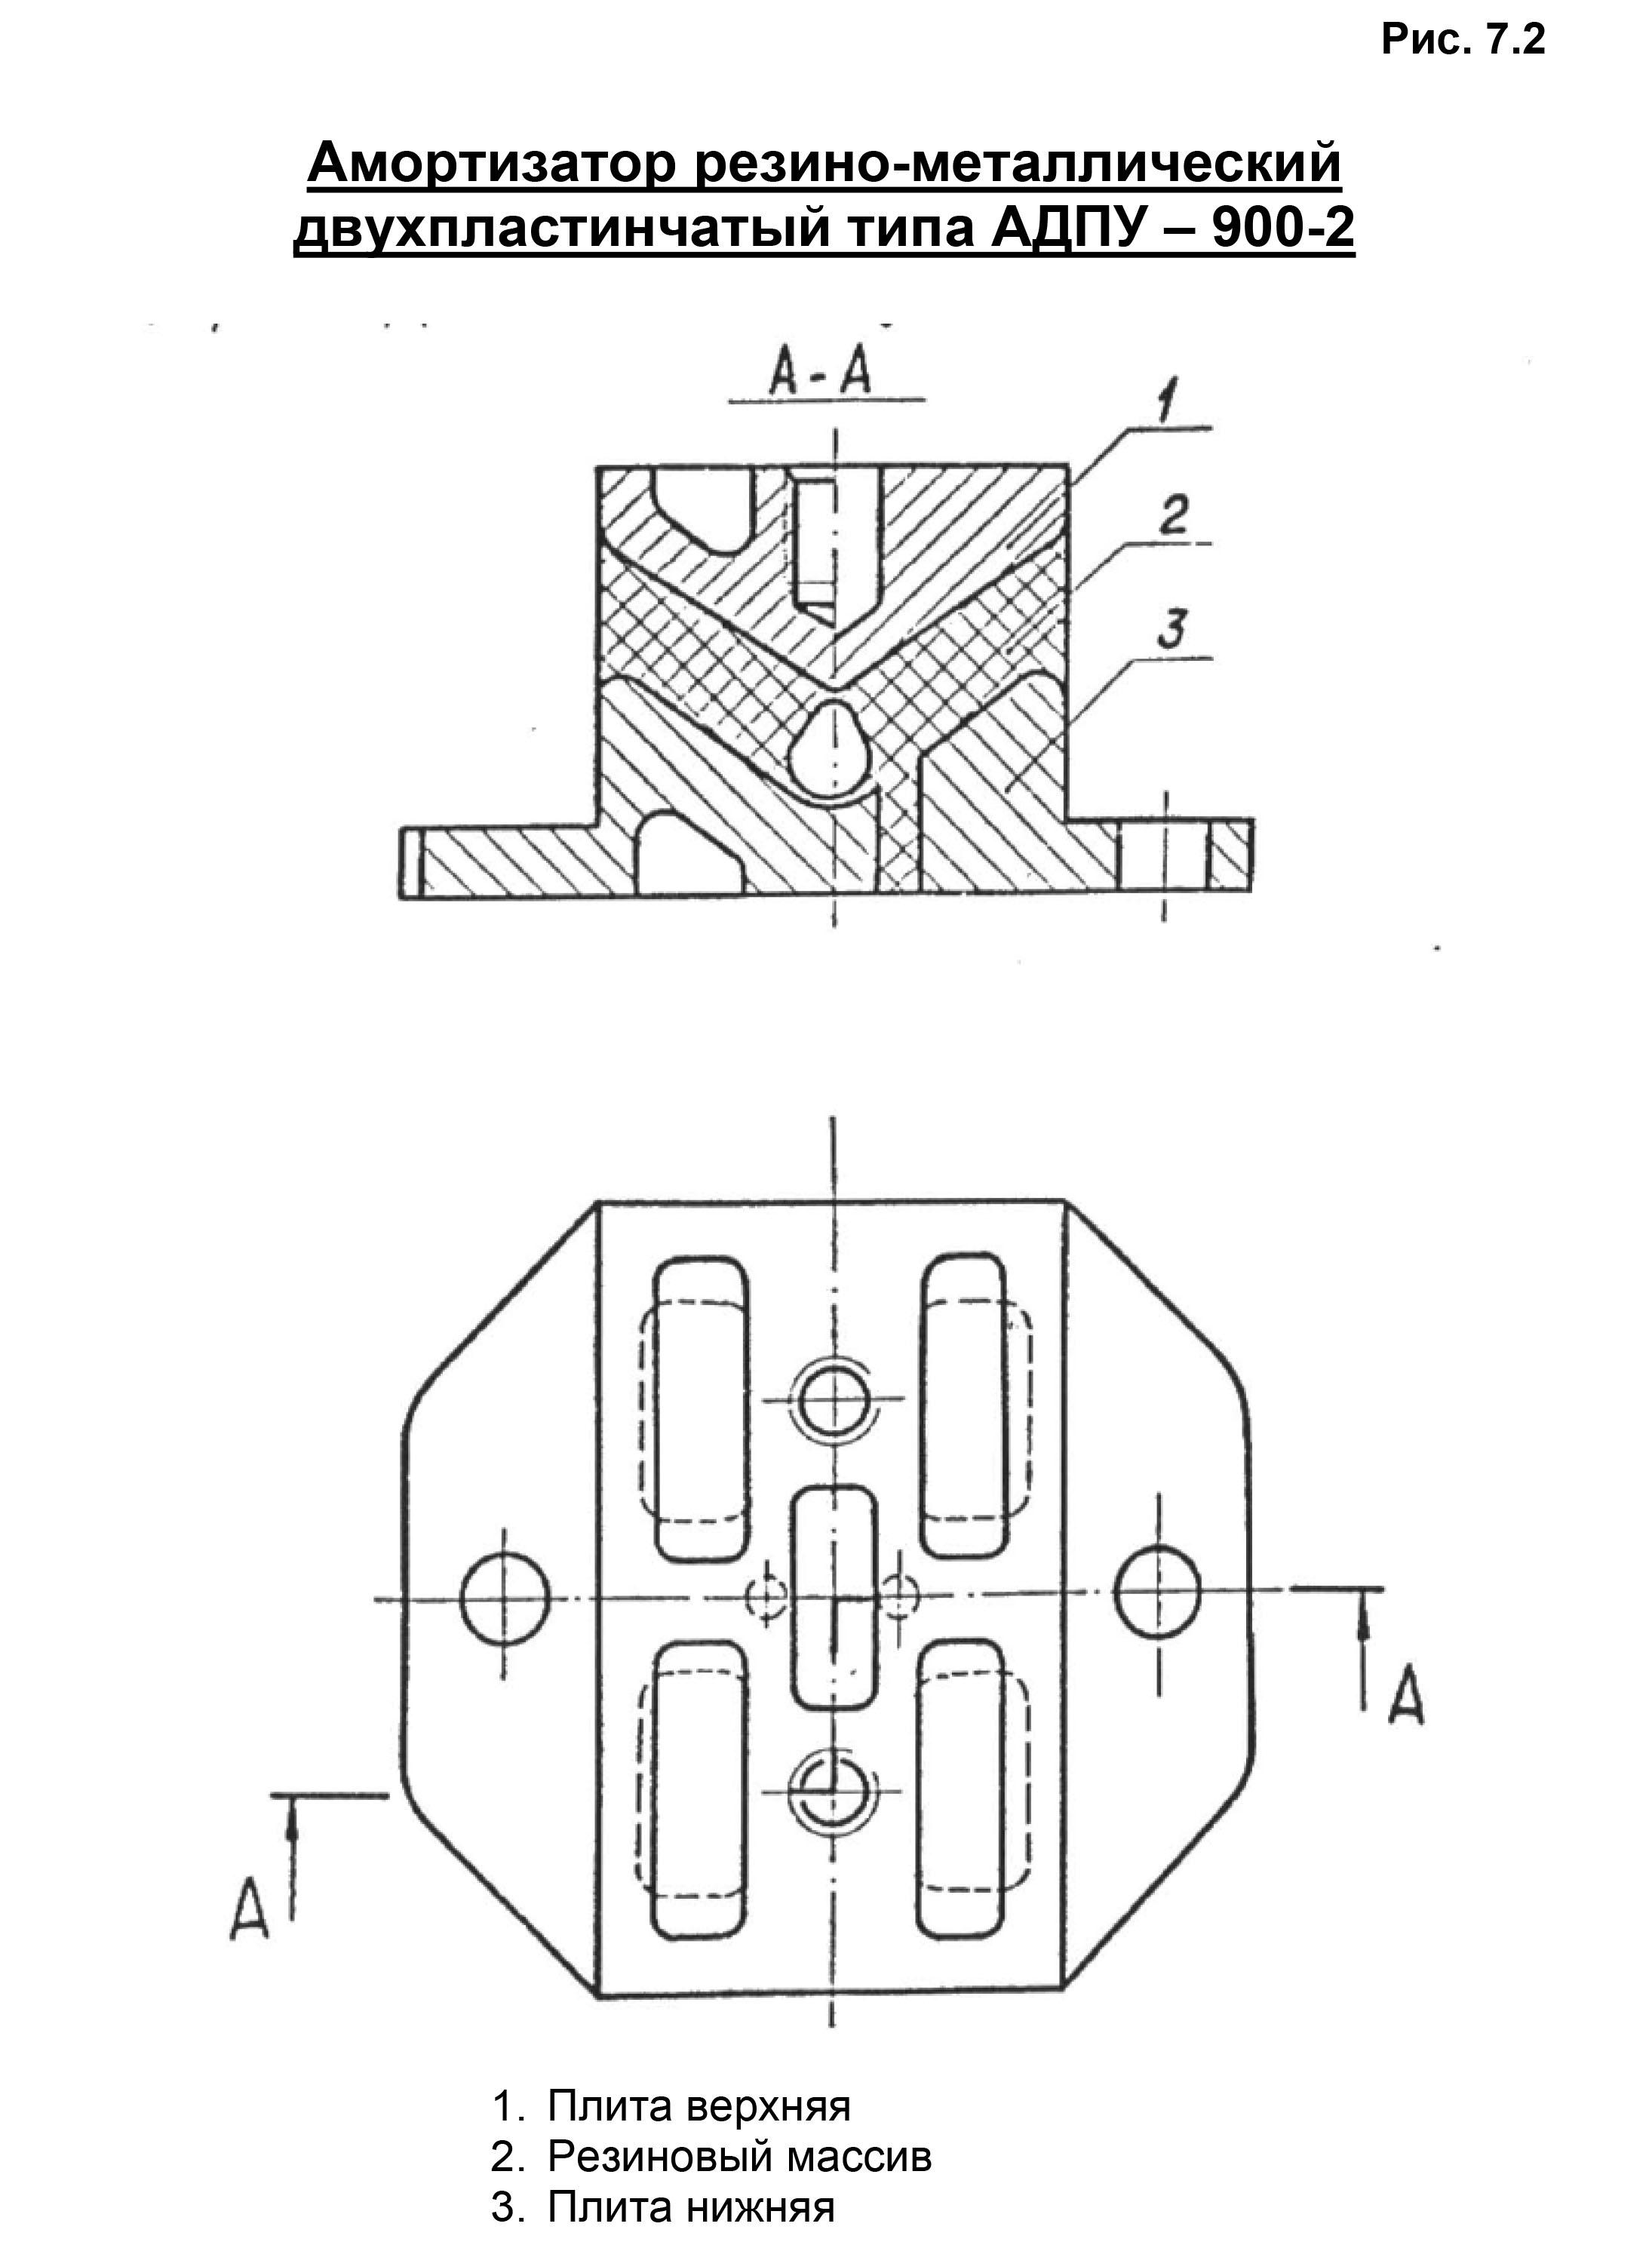 Амортизатор АДПУ-900-2